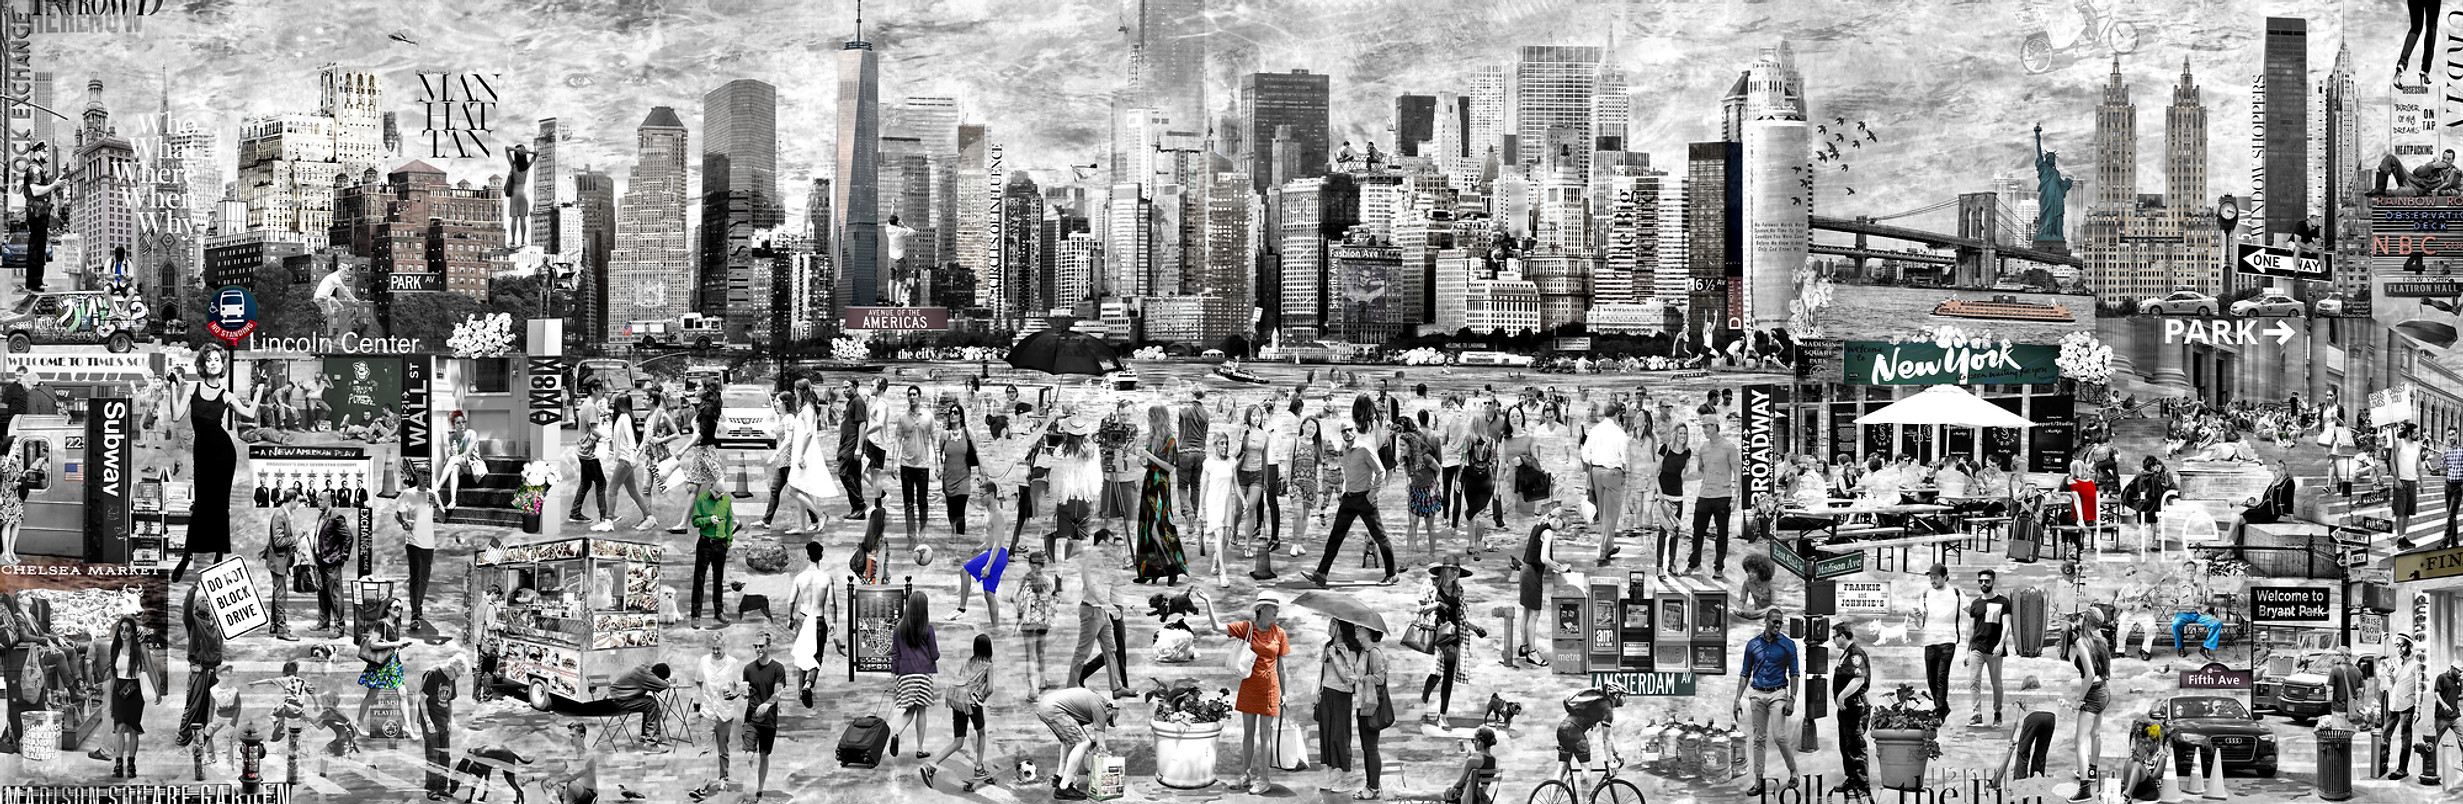 New York Synchronicity